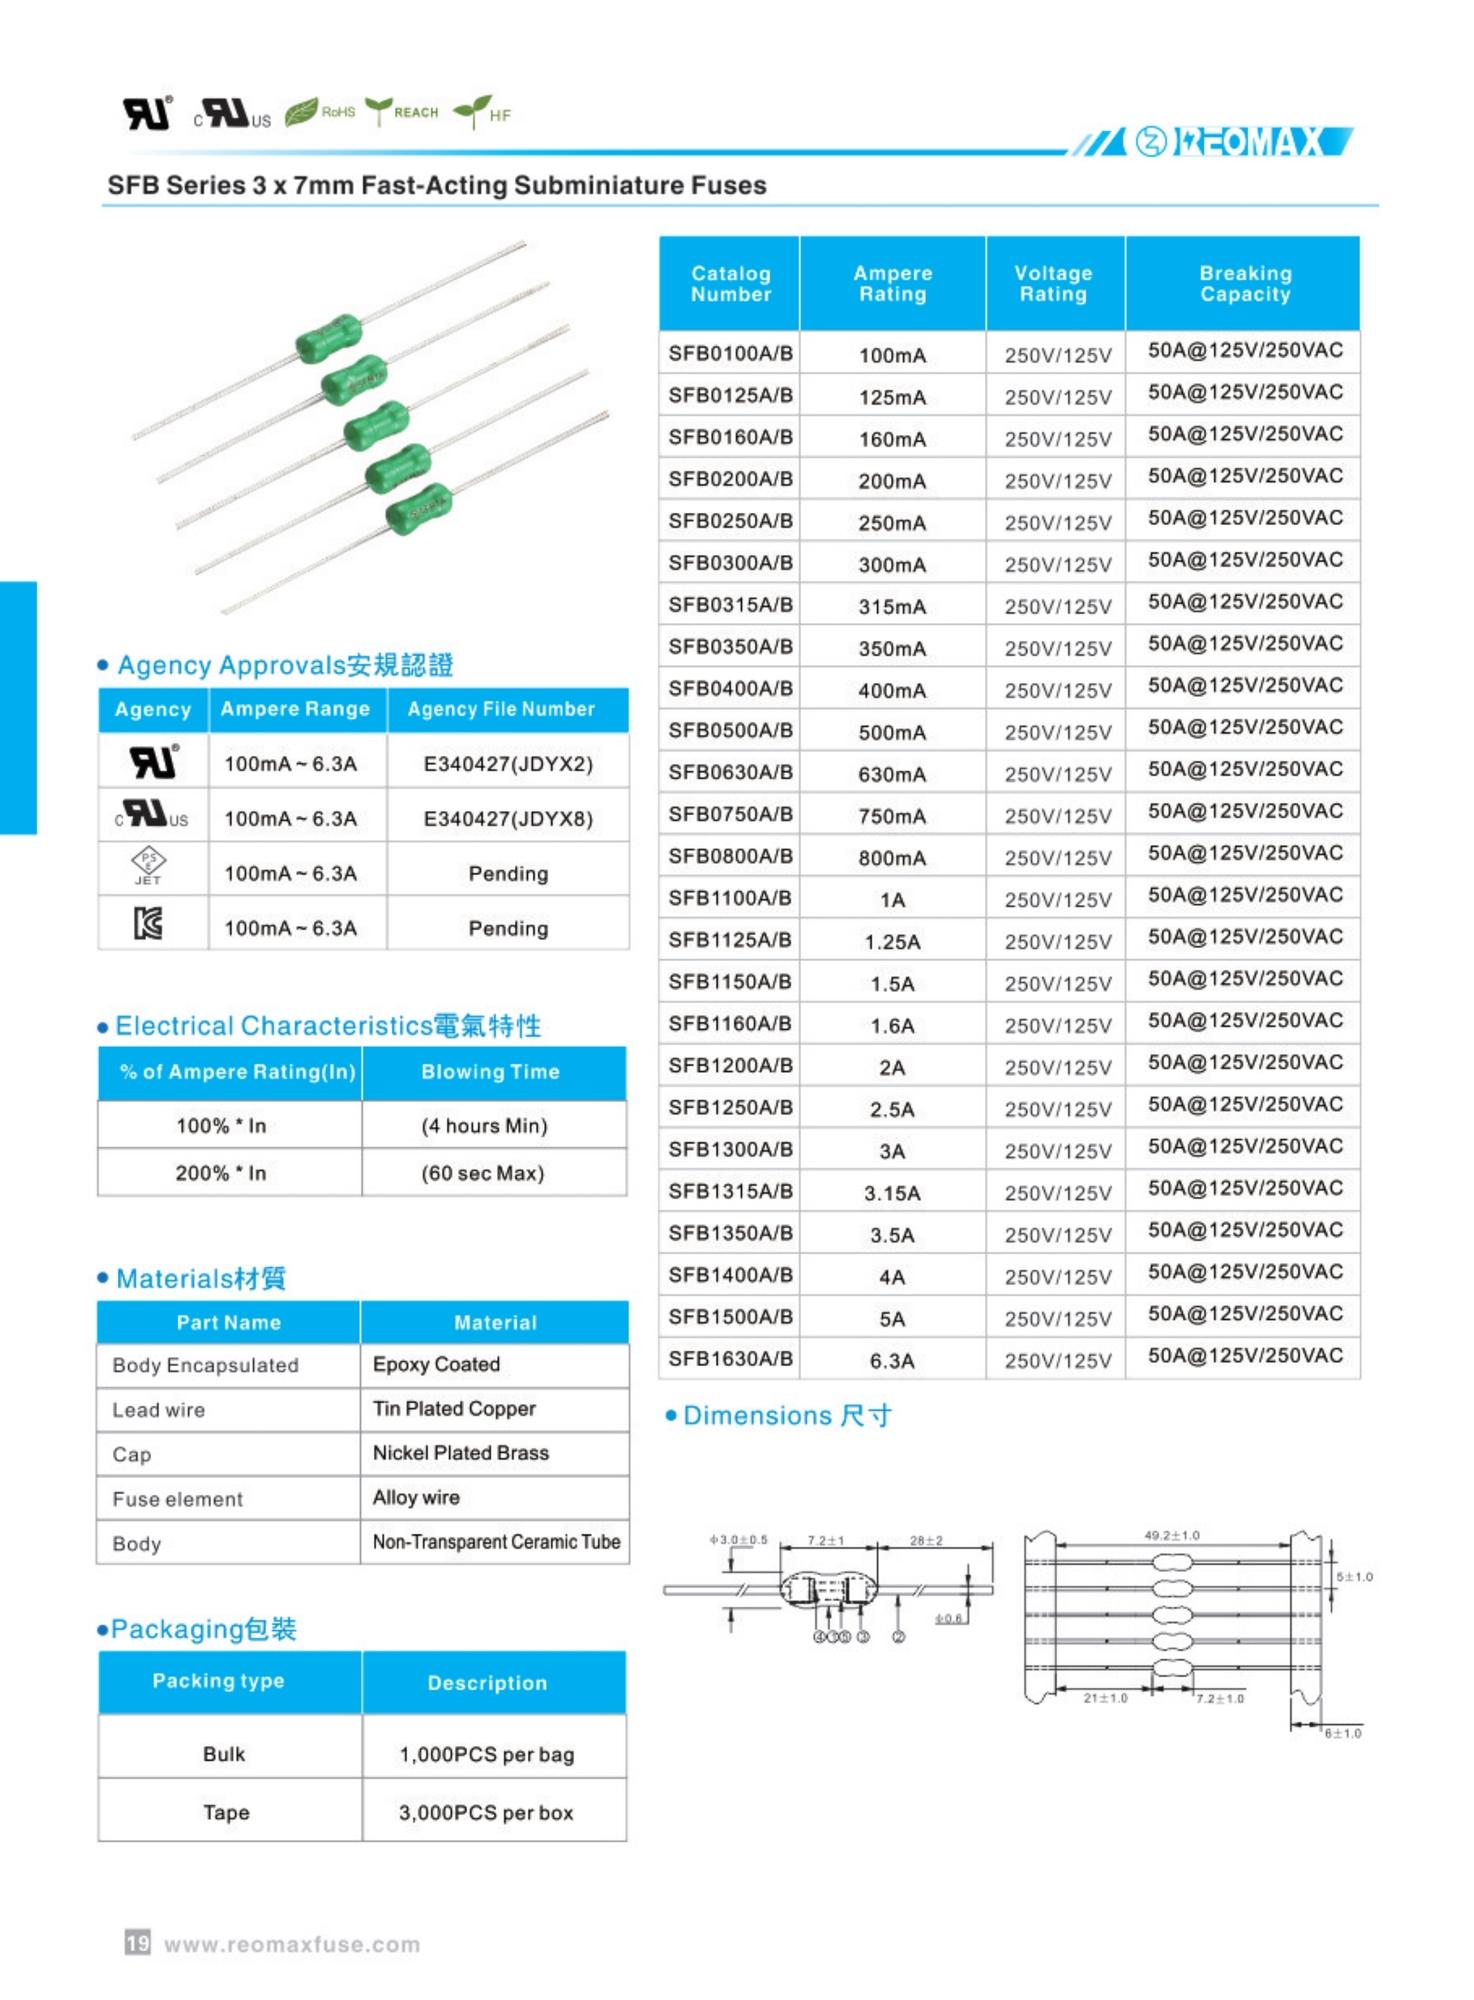 c807516a58aed3535aabc9fdf19c8f03.jpg